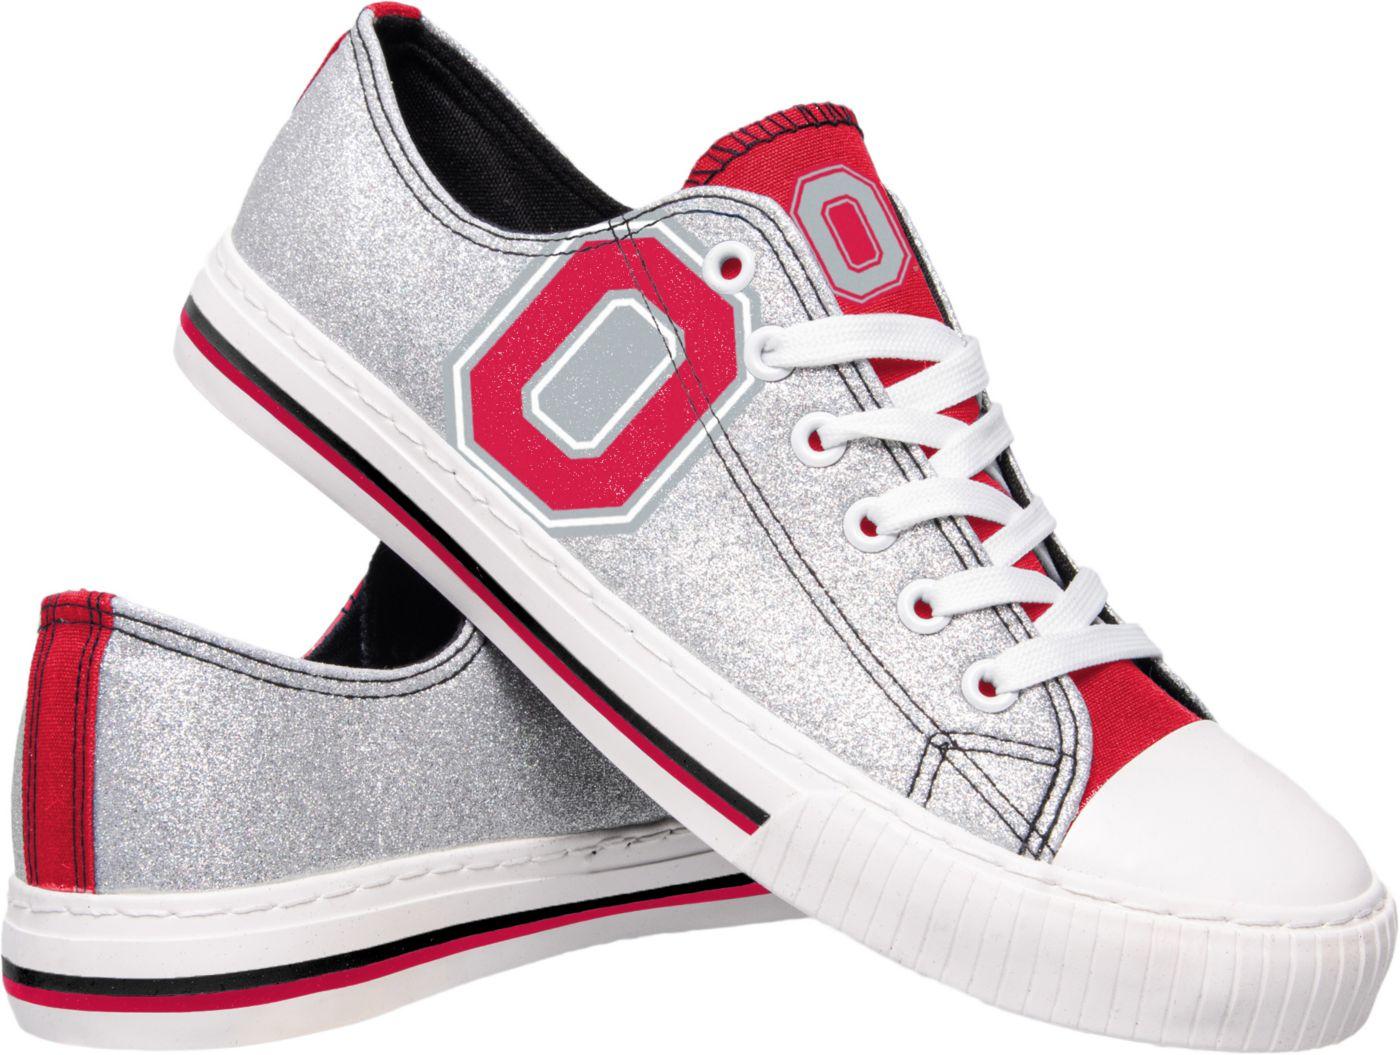 FOCO Ohio State Buckeyes Women's Glitter Canvas Shoes